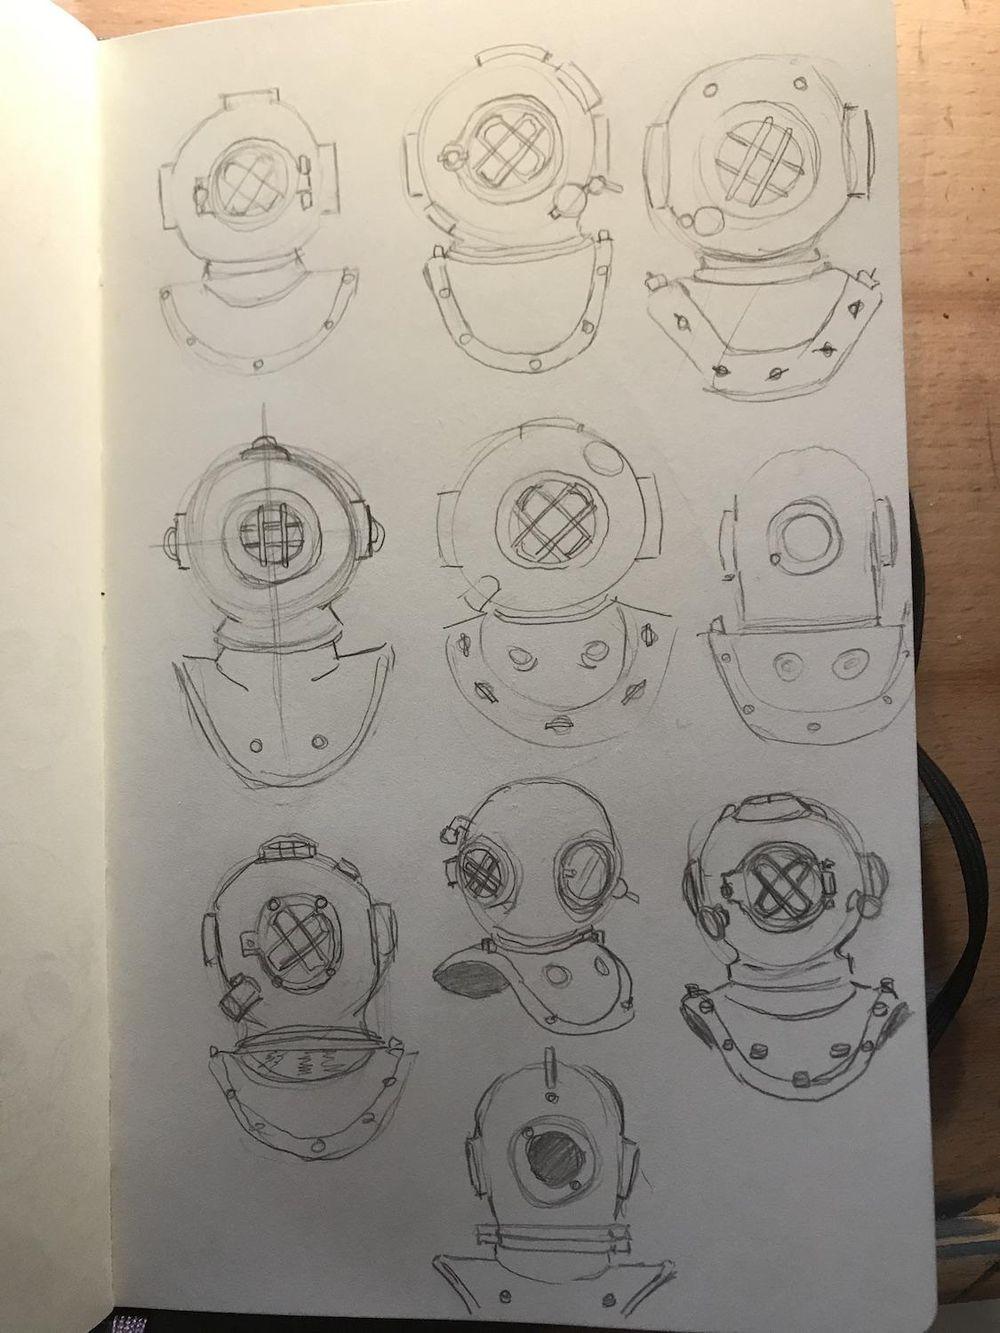 Diver Helmet Monoline Illustration - image 4 - student project